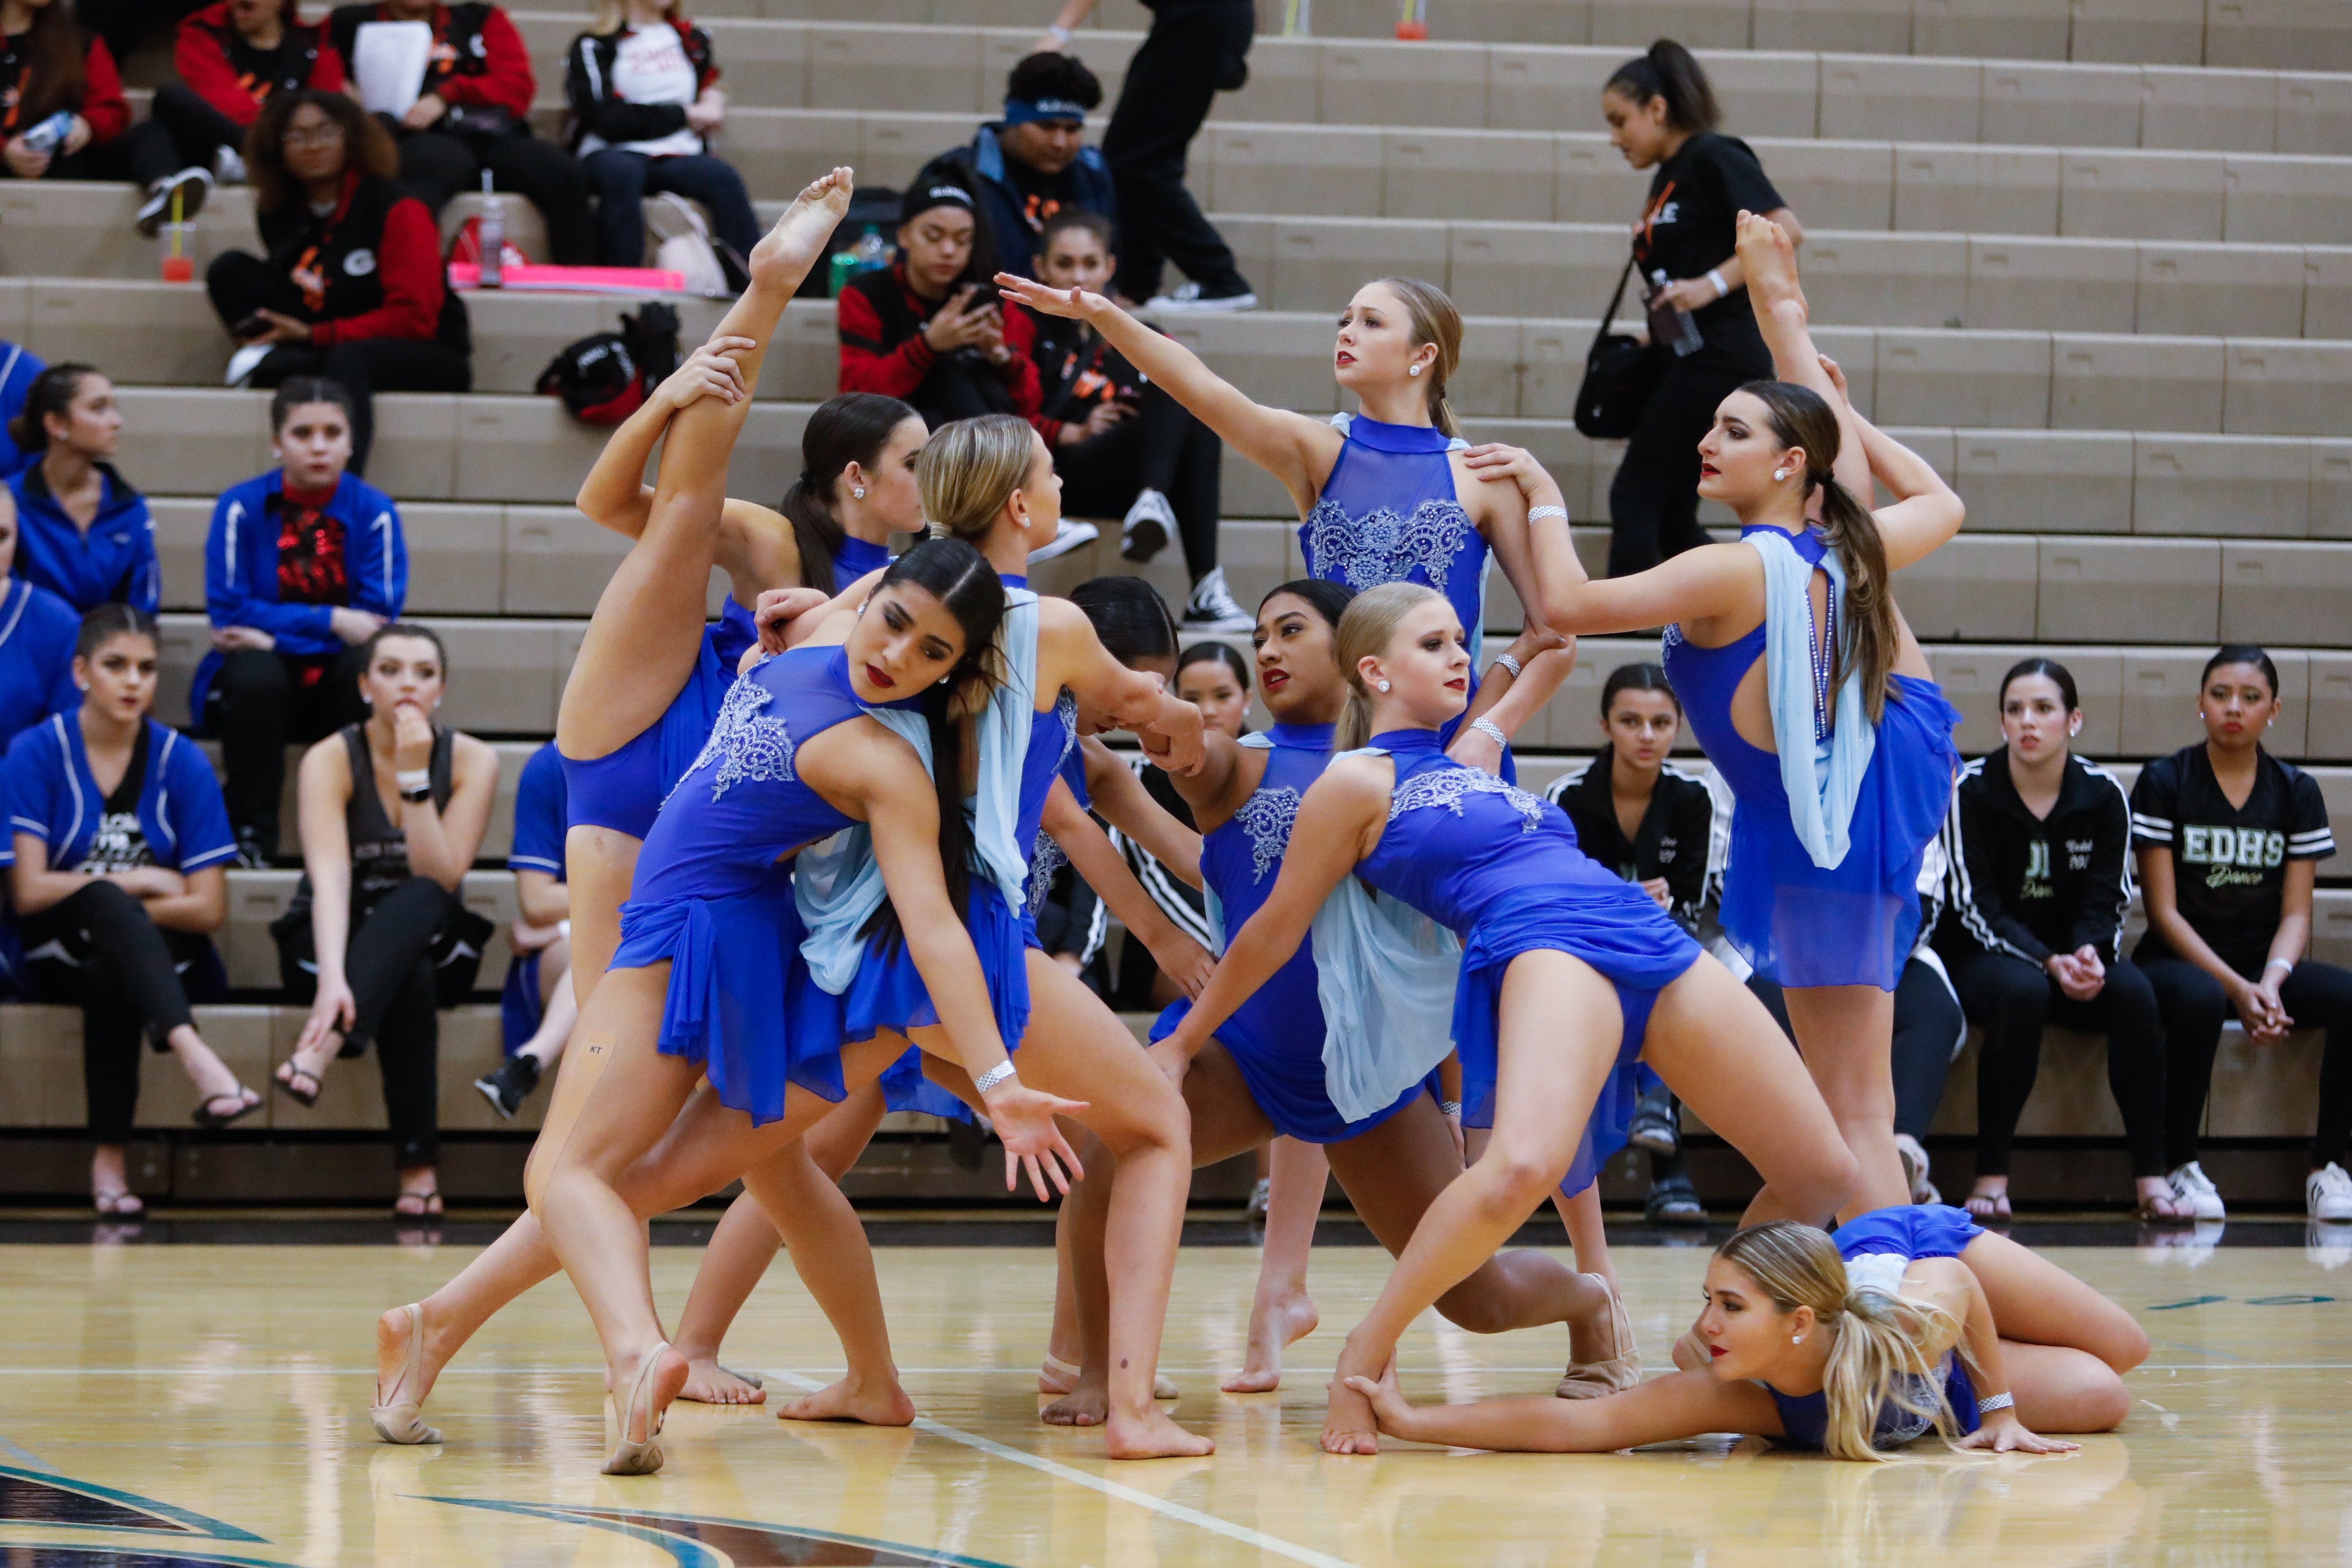 Dance Team 2018/19 - Santa Margarita Catholic High School